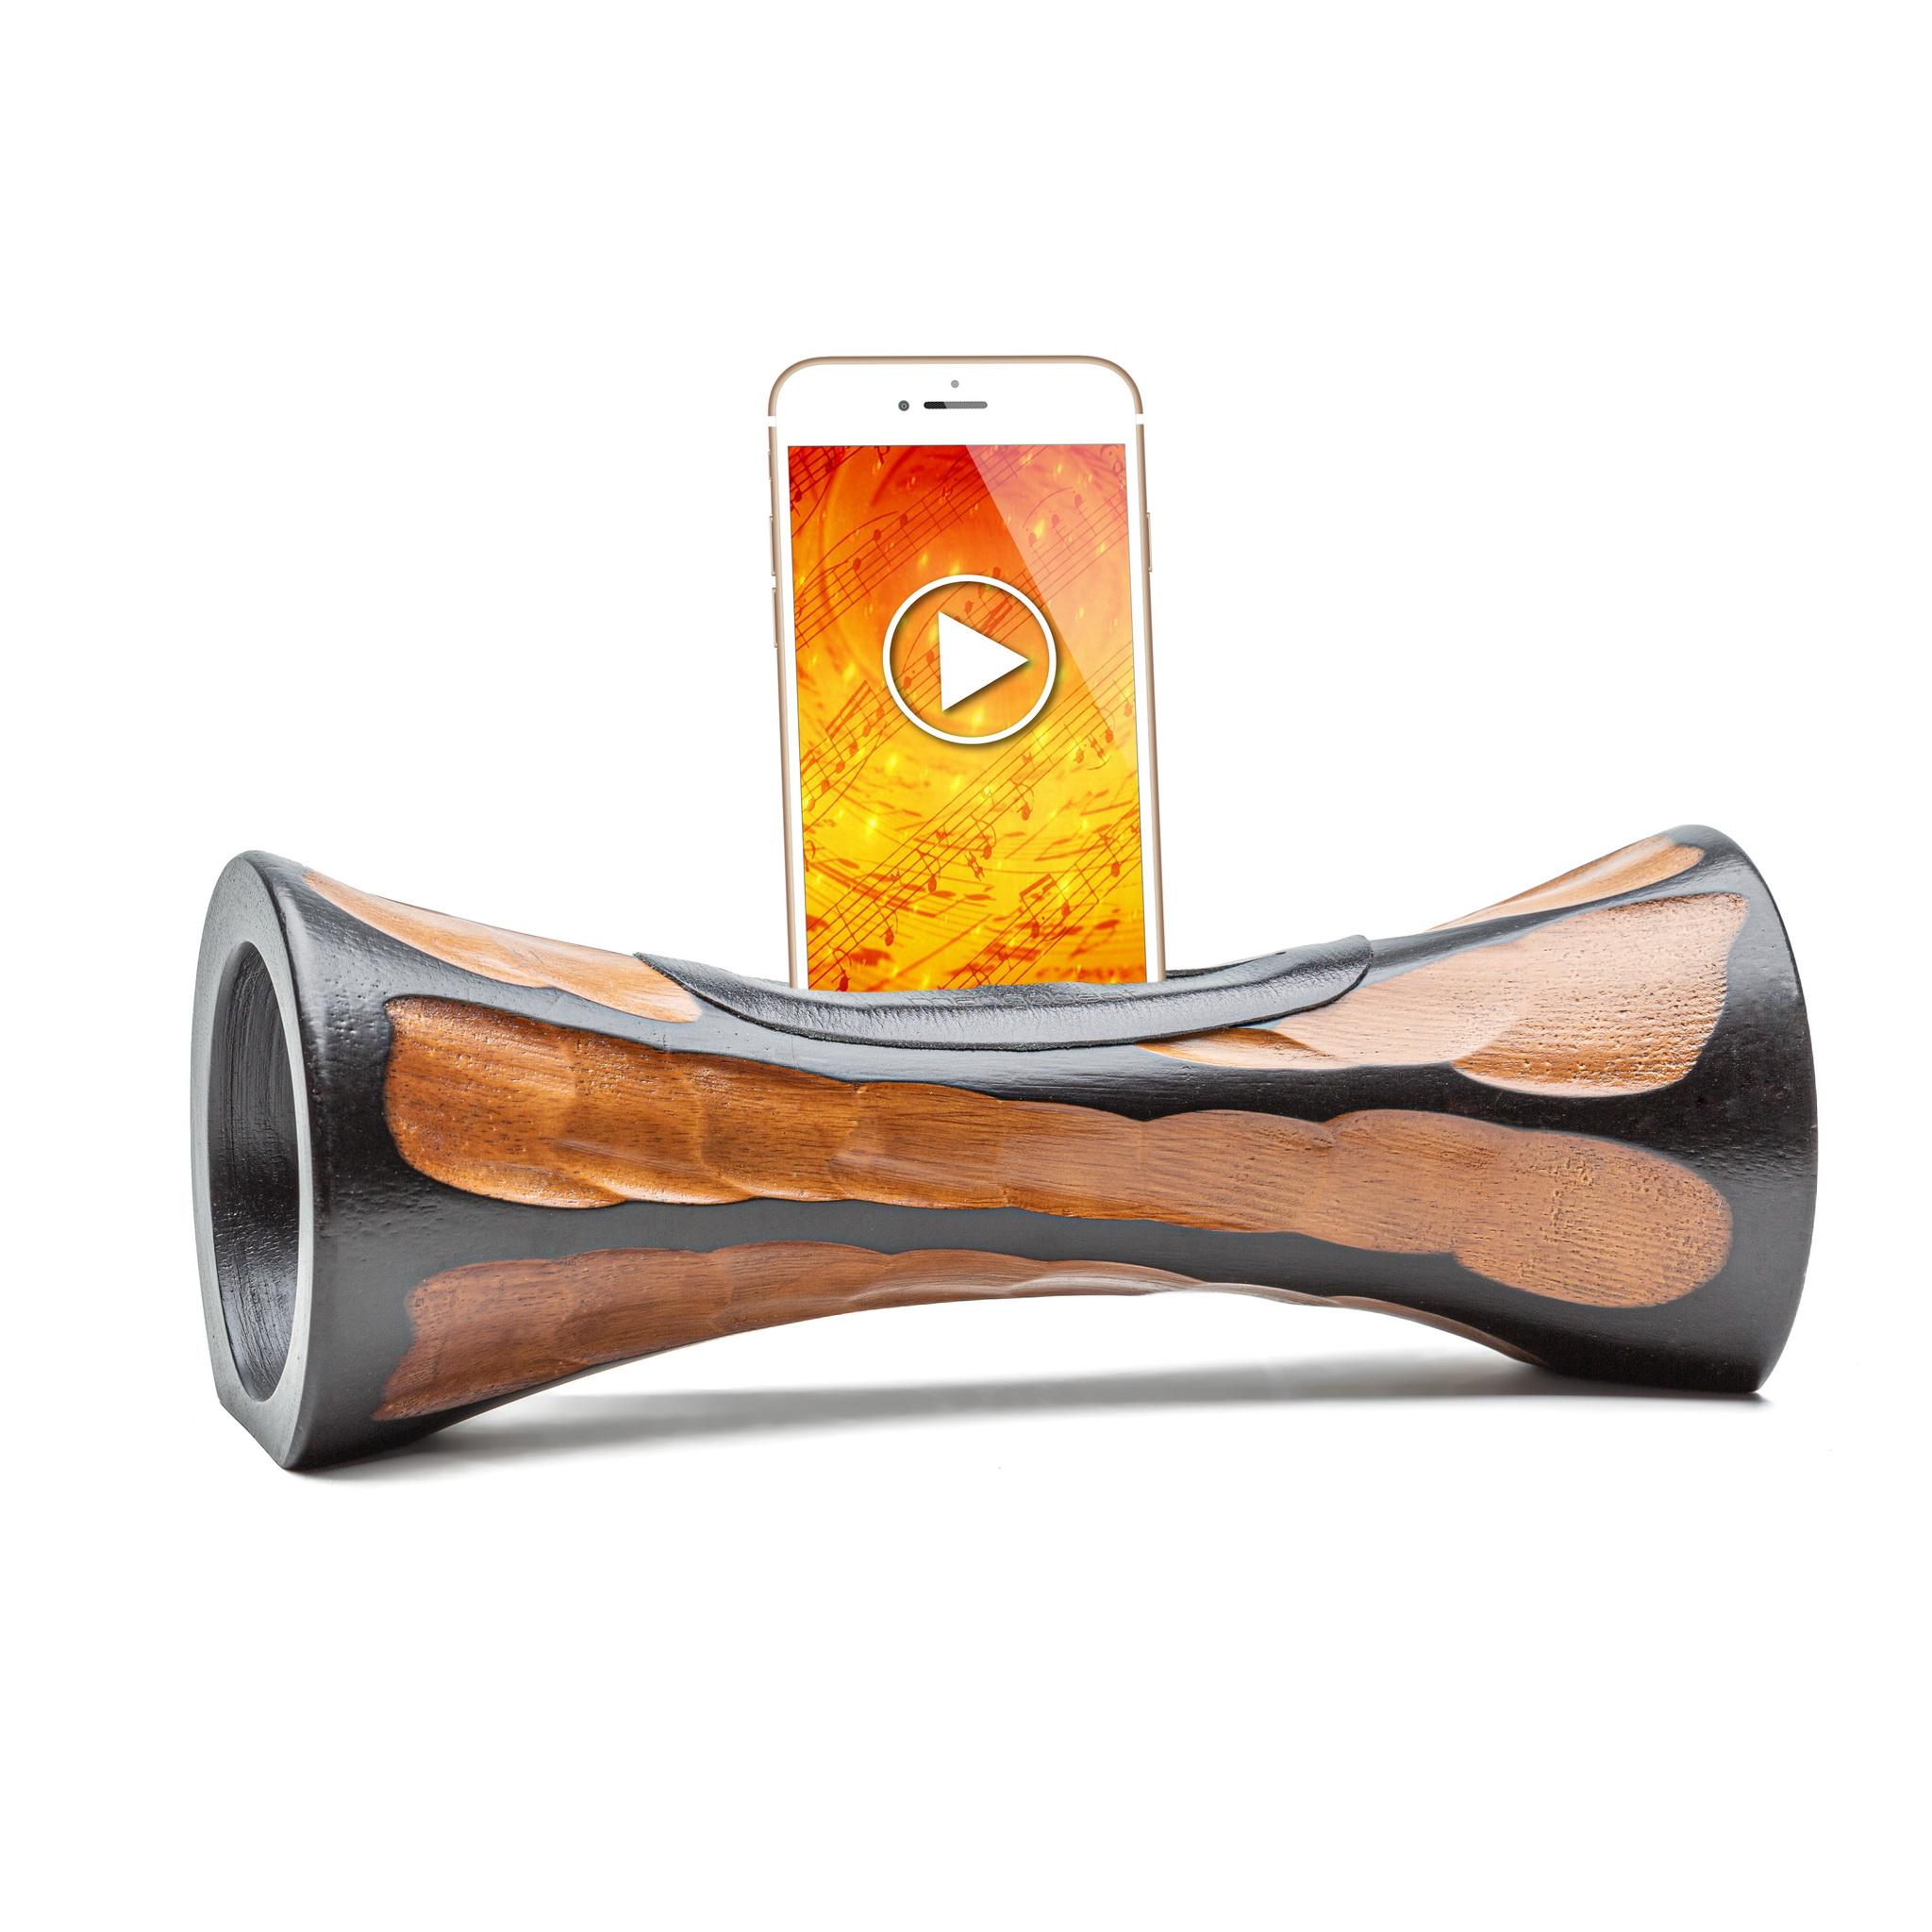 Mangobeat - MANGOBEAT - Enceinte en bois pour téléphone - Amplificateur son